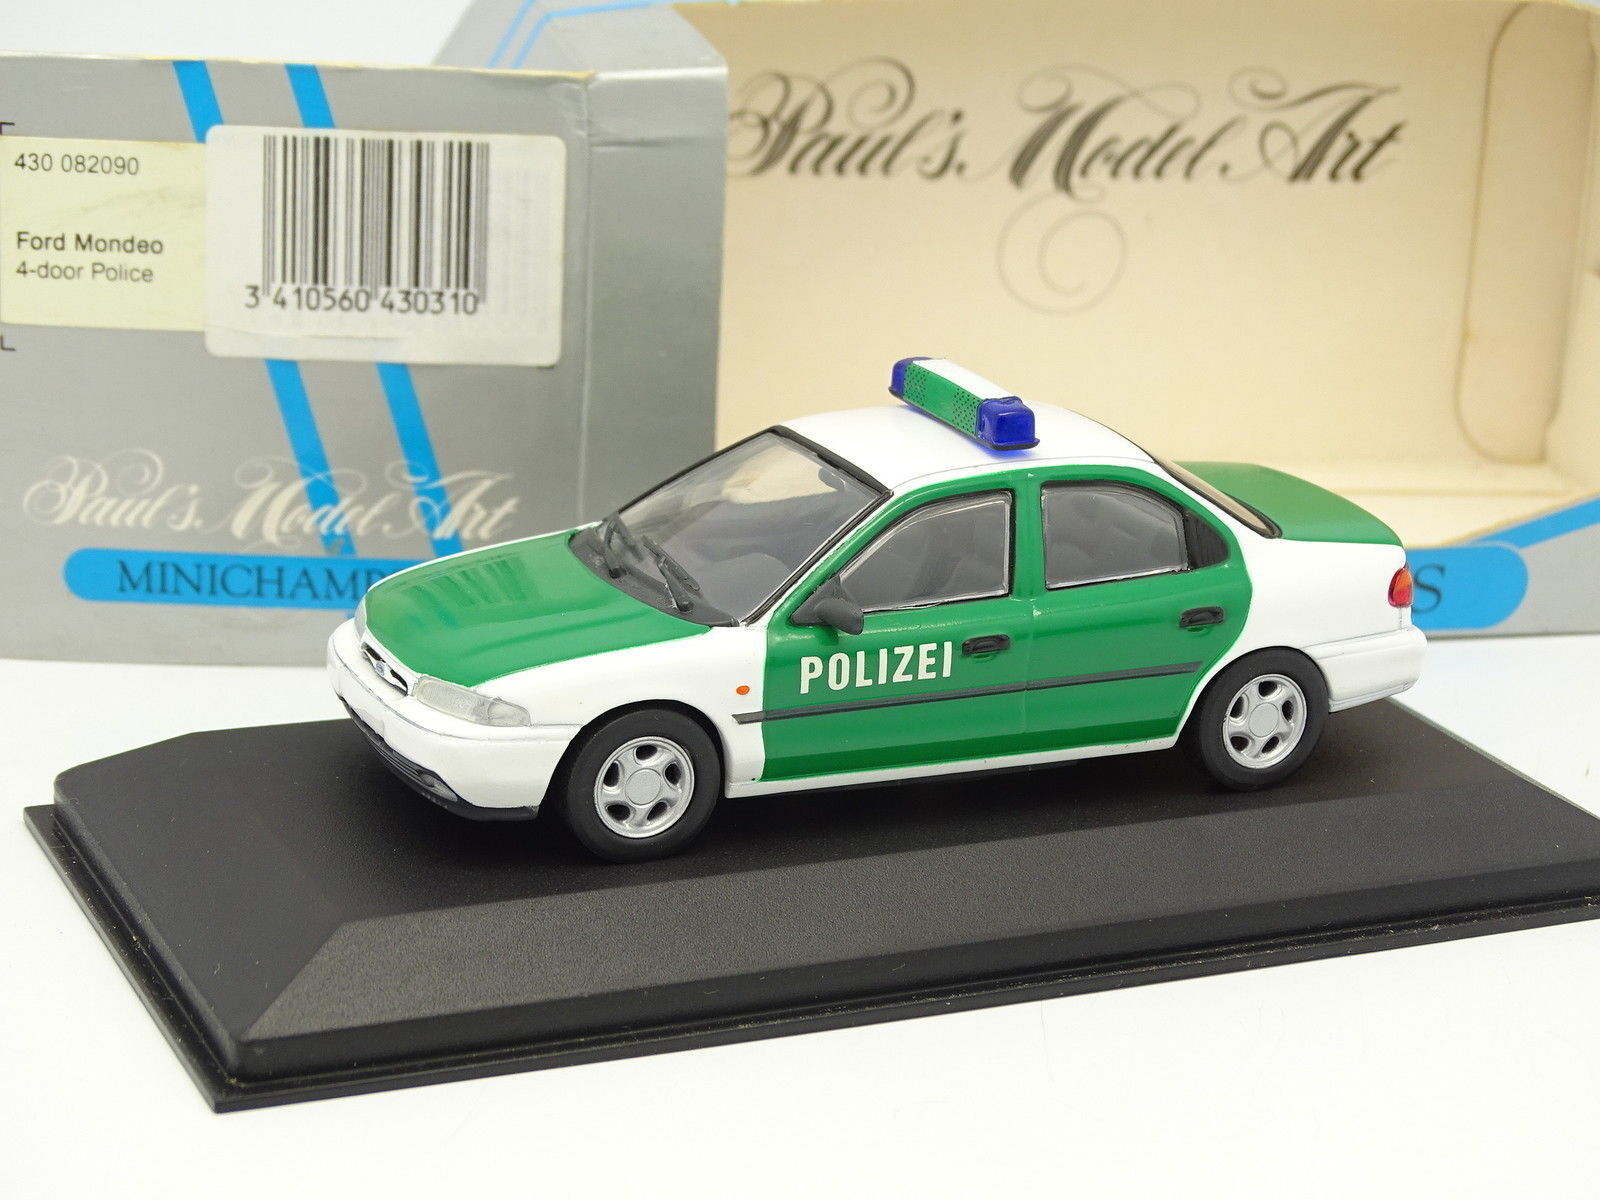 muy popular Minichamps 1 1 1 43 - Ford Mondeo Polizei  precios mas baratos